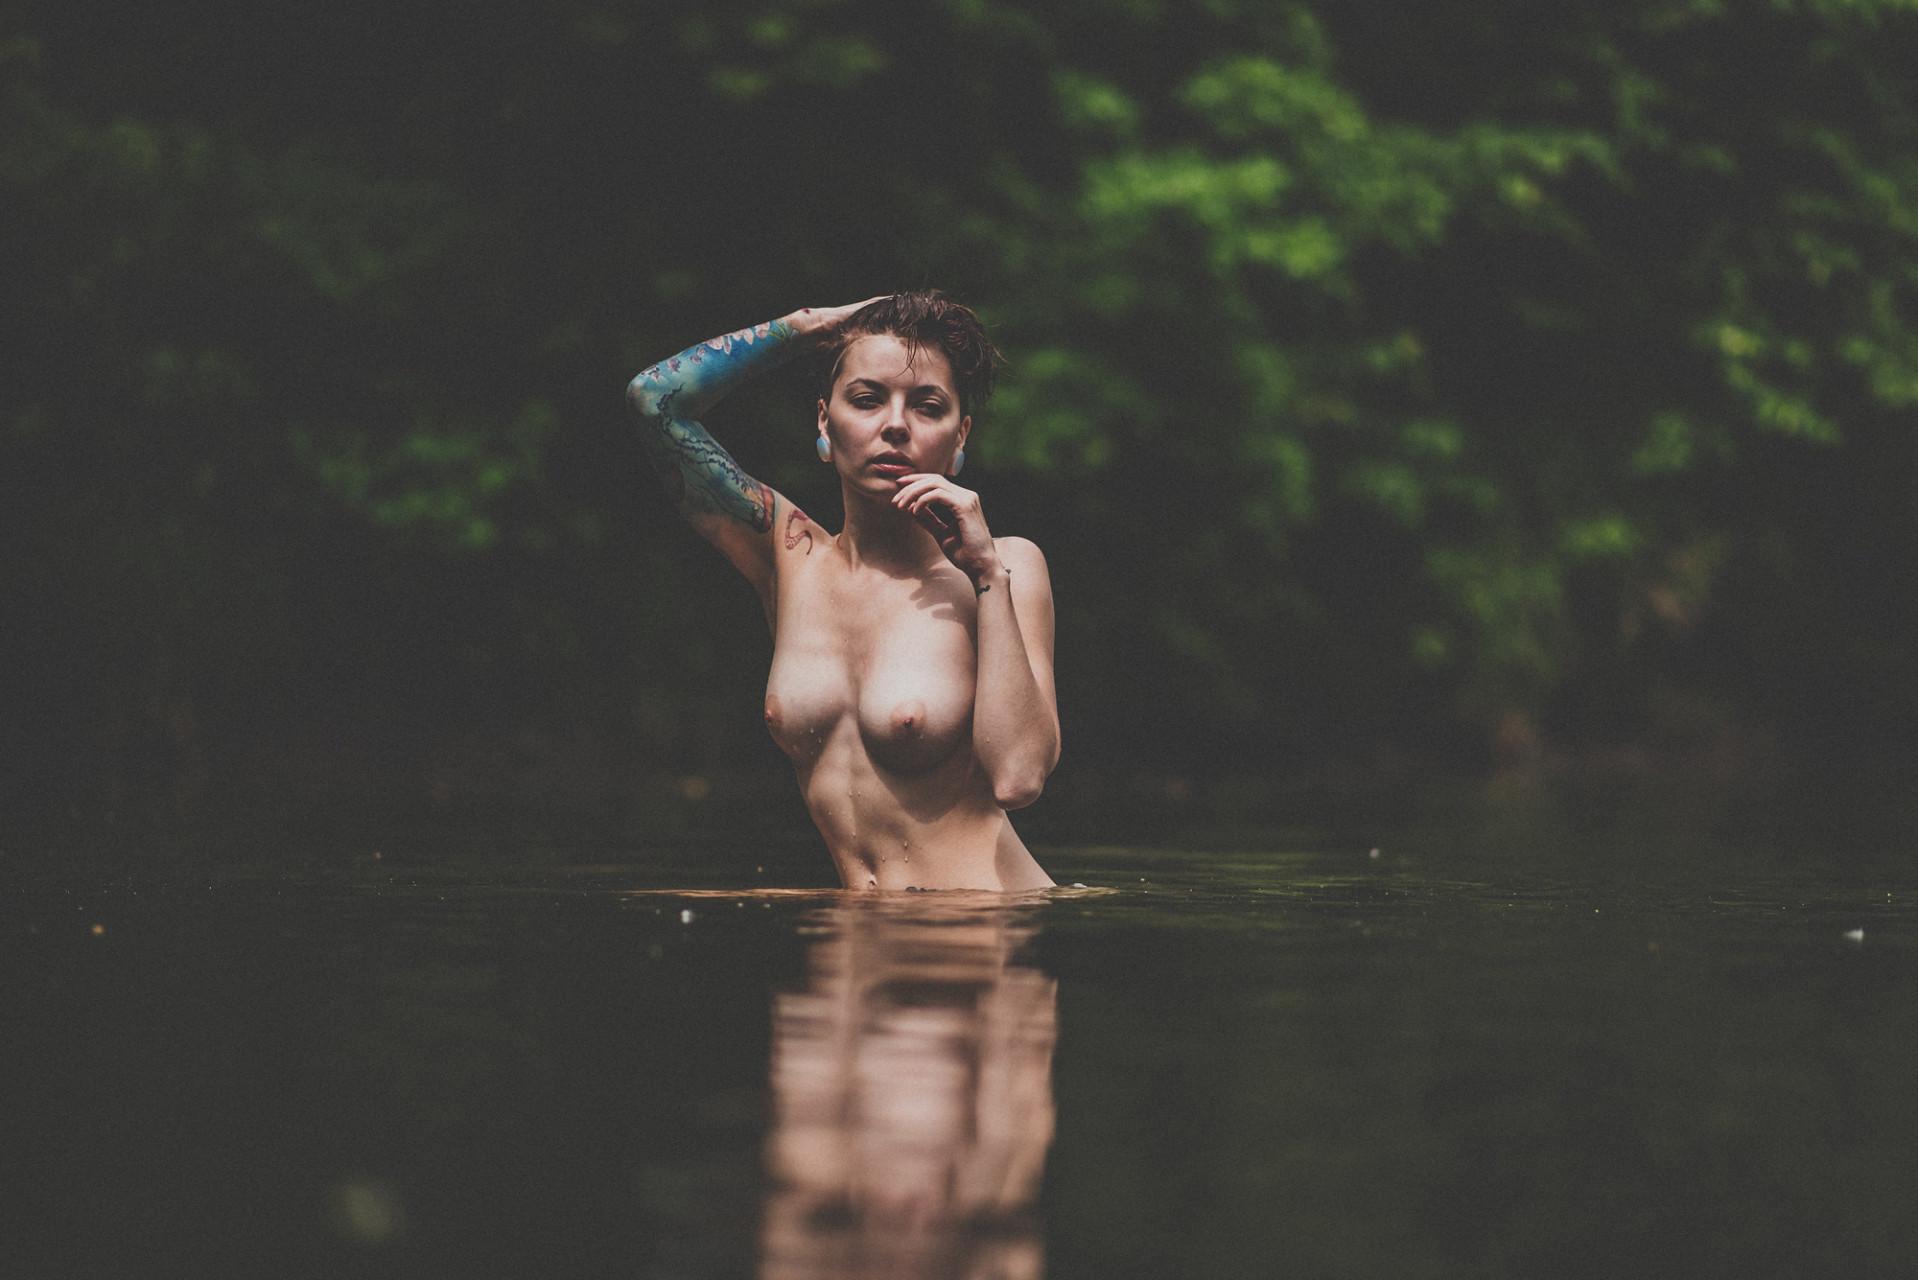 BeckyNature_007